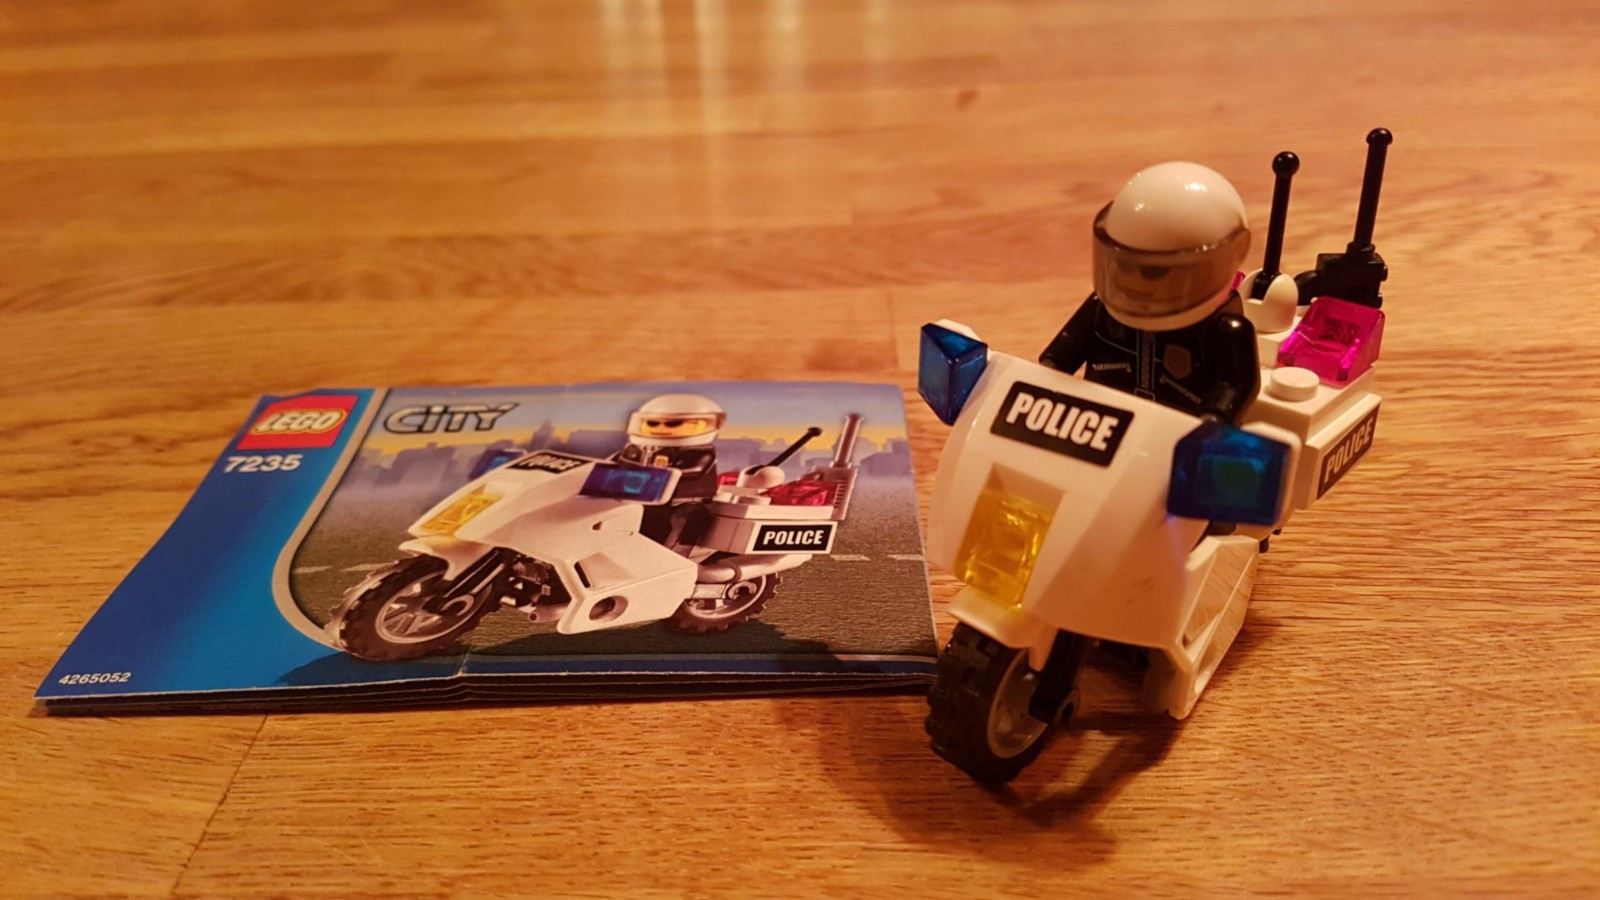 Lego 7235 - Lego City politi motorsykkel - Hommelvik  - Lego 7235 - Lego City politi motorsykkel, helt komplett med byggeinstruksjoner. - Hommelvik